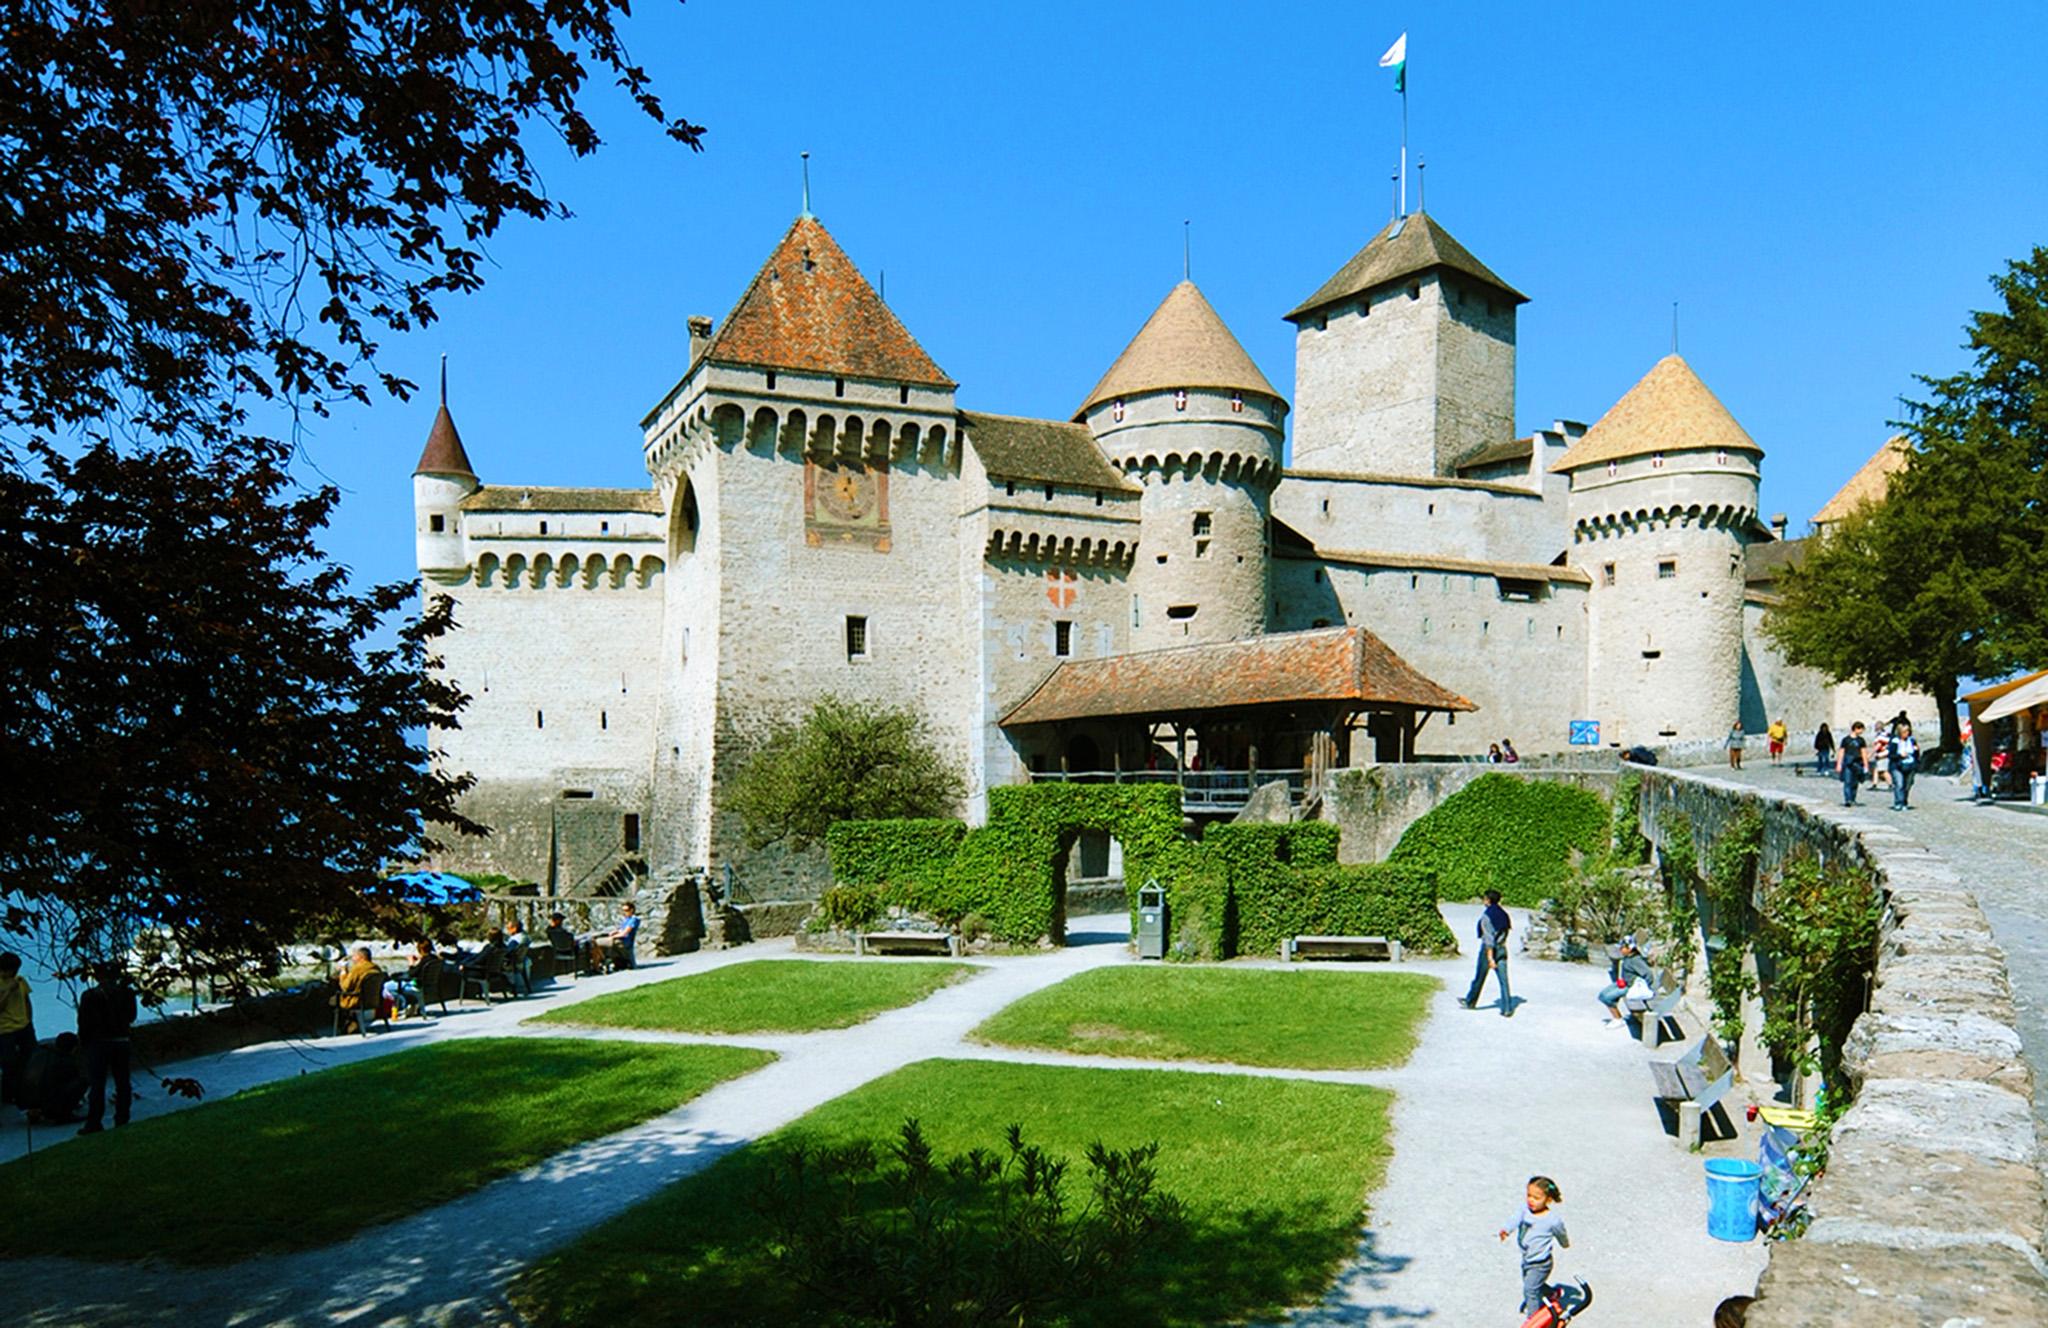 kt_2020_300_Keytours_excursions_Swisstours_chateau chillon4_2048_10